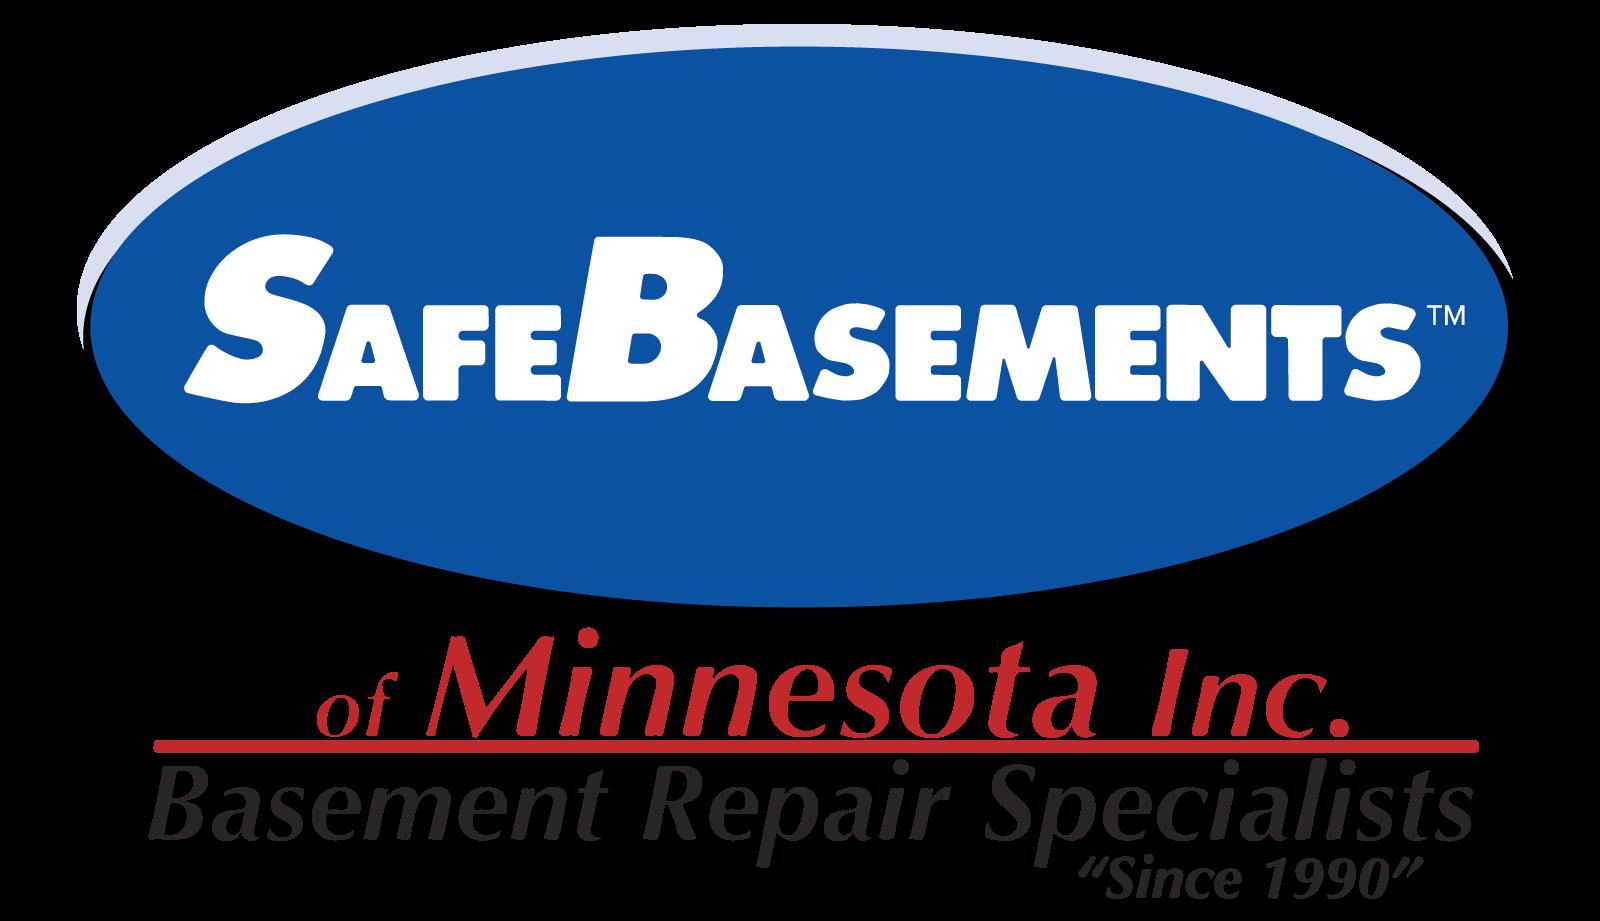 Safe Basements logo